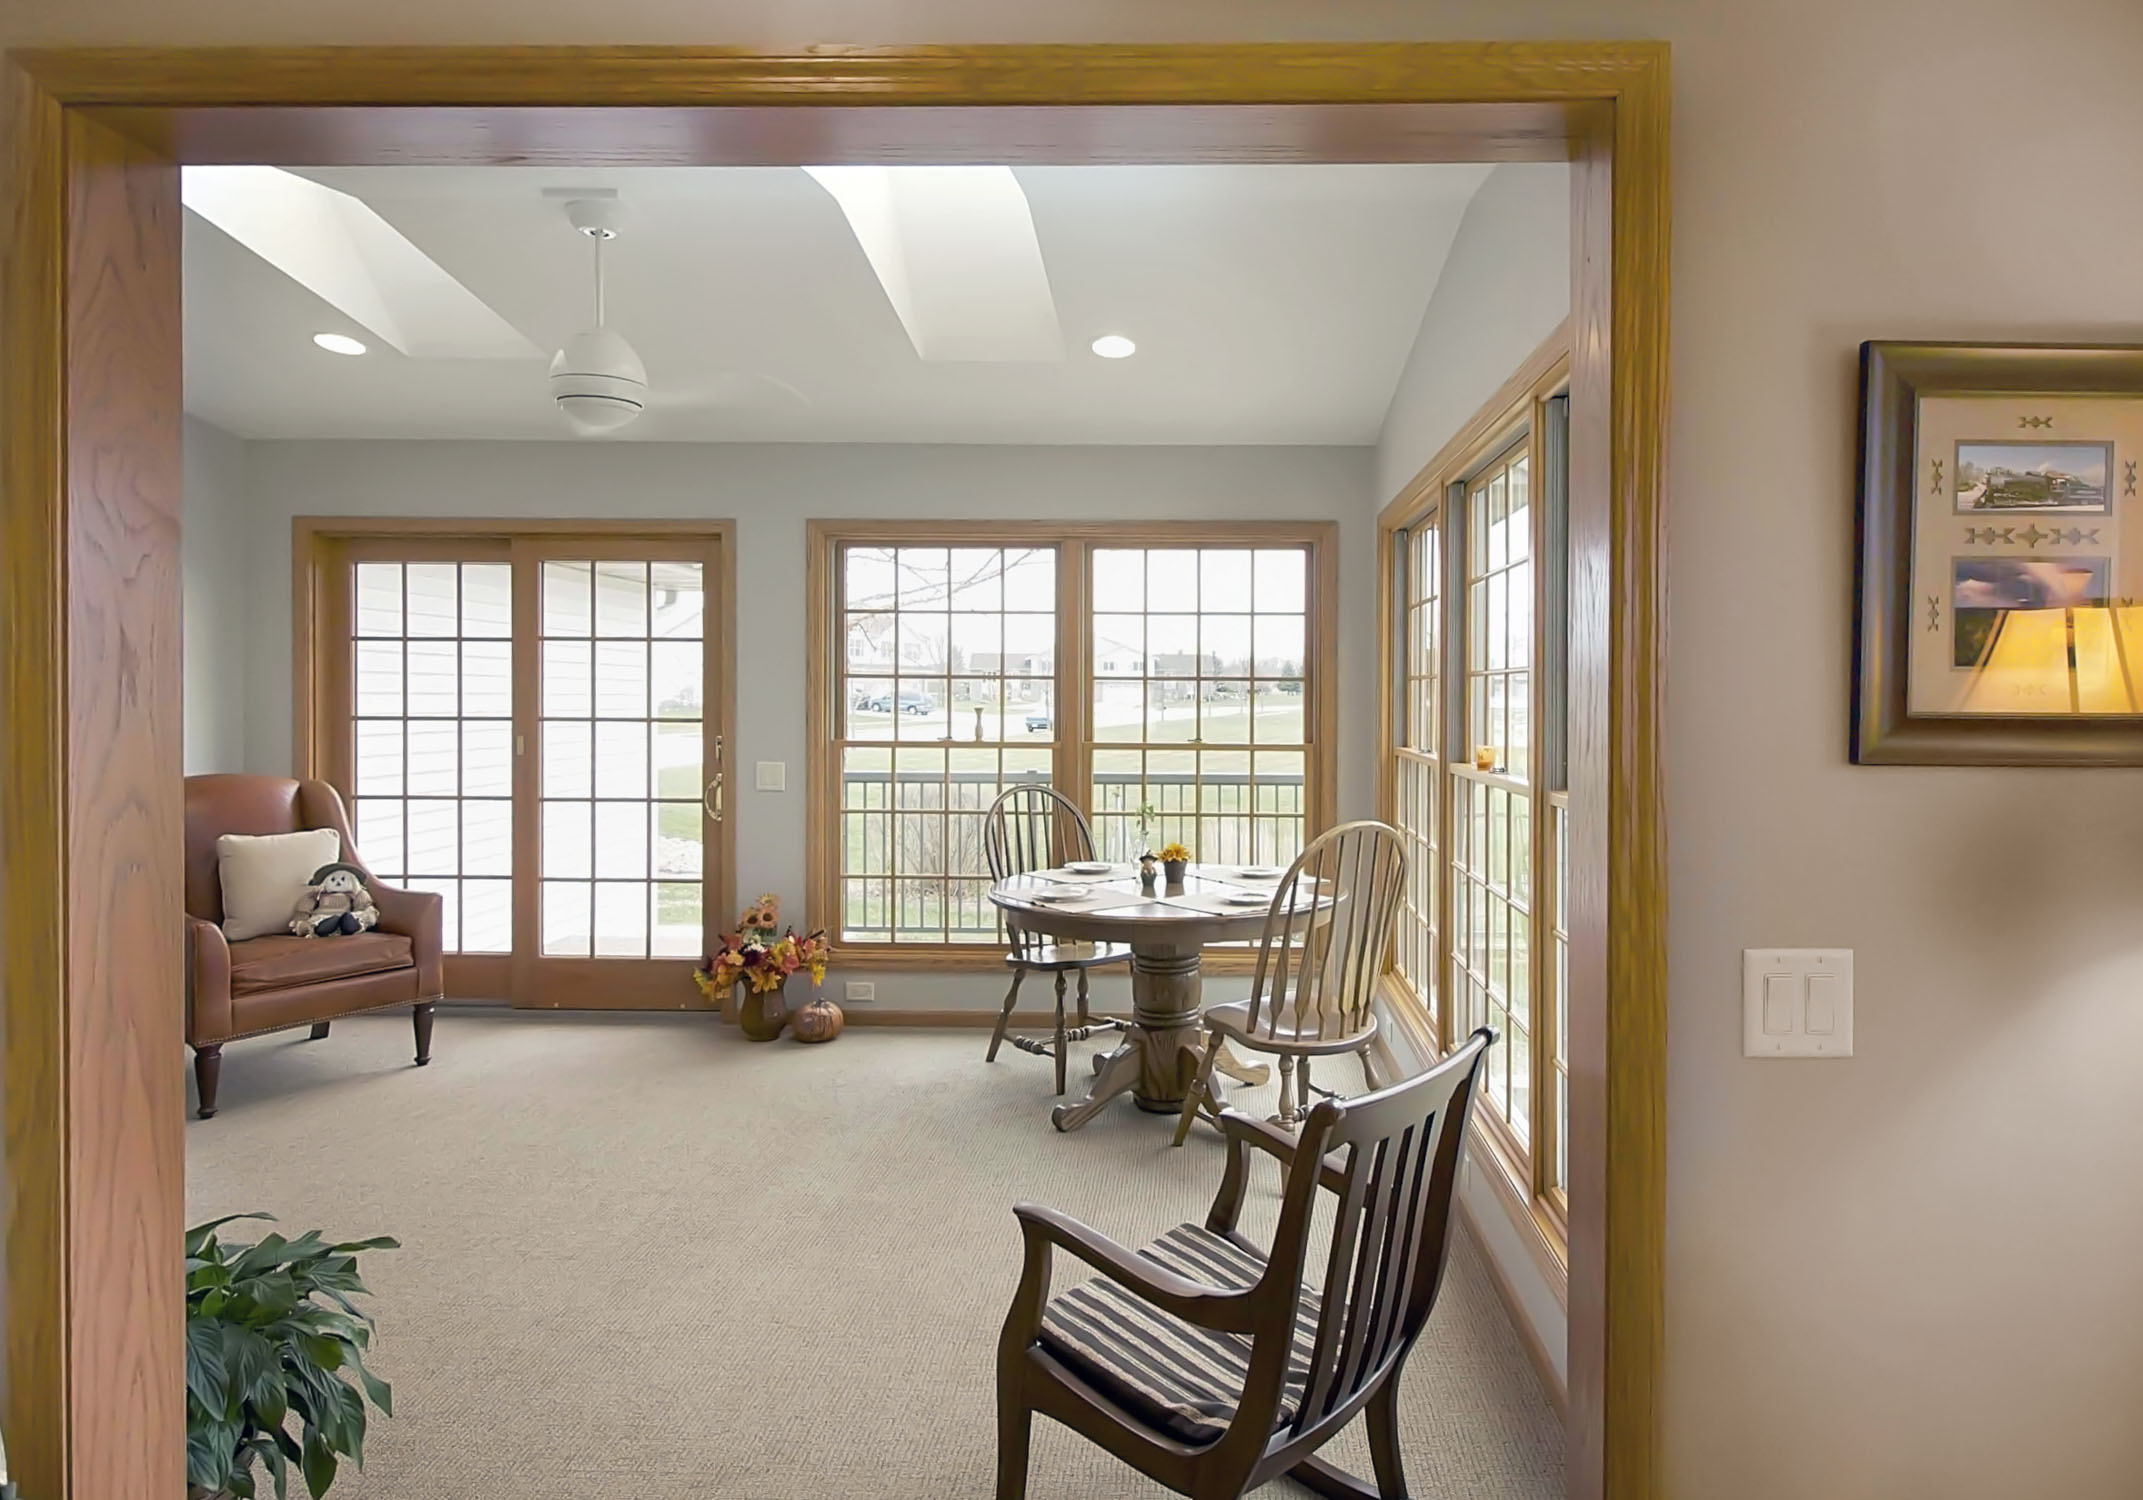 Oak Woodwork, large wood framed Windows and Skylights